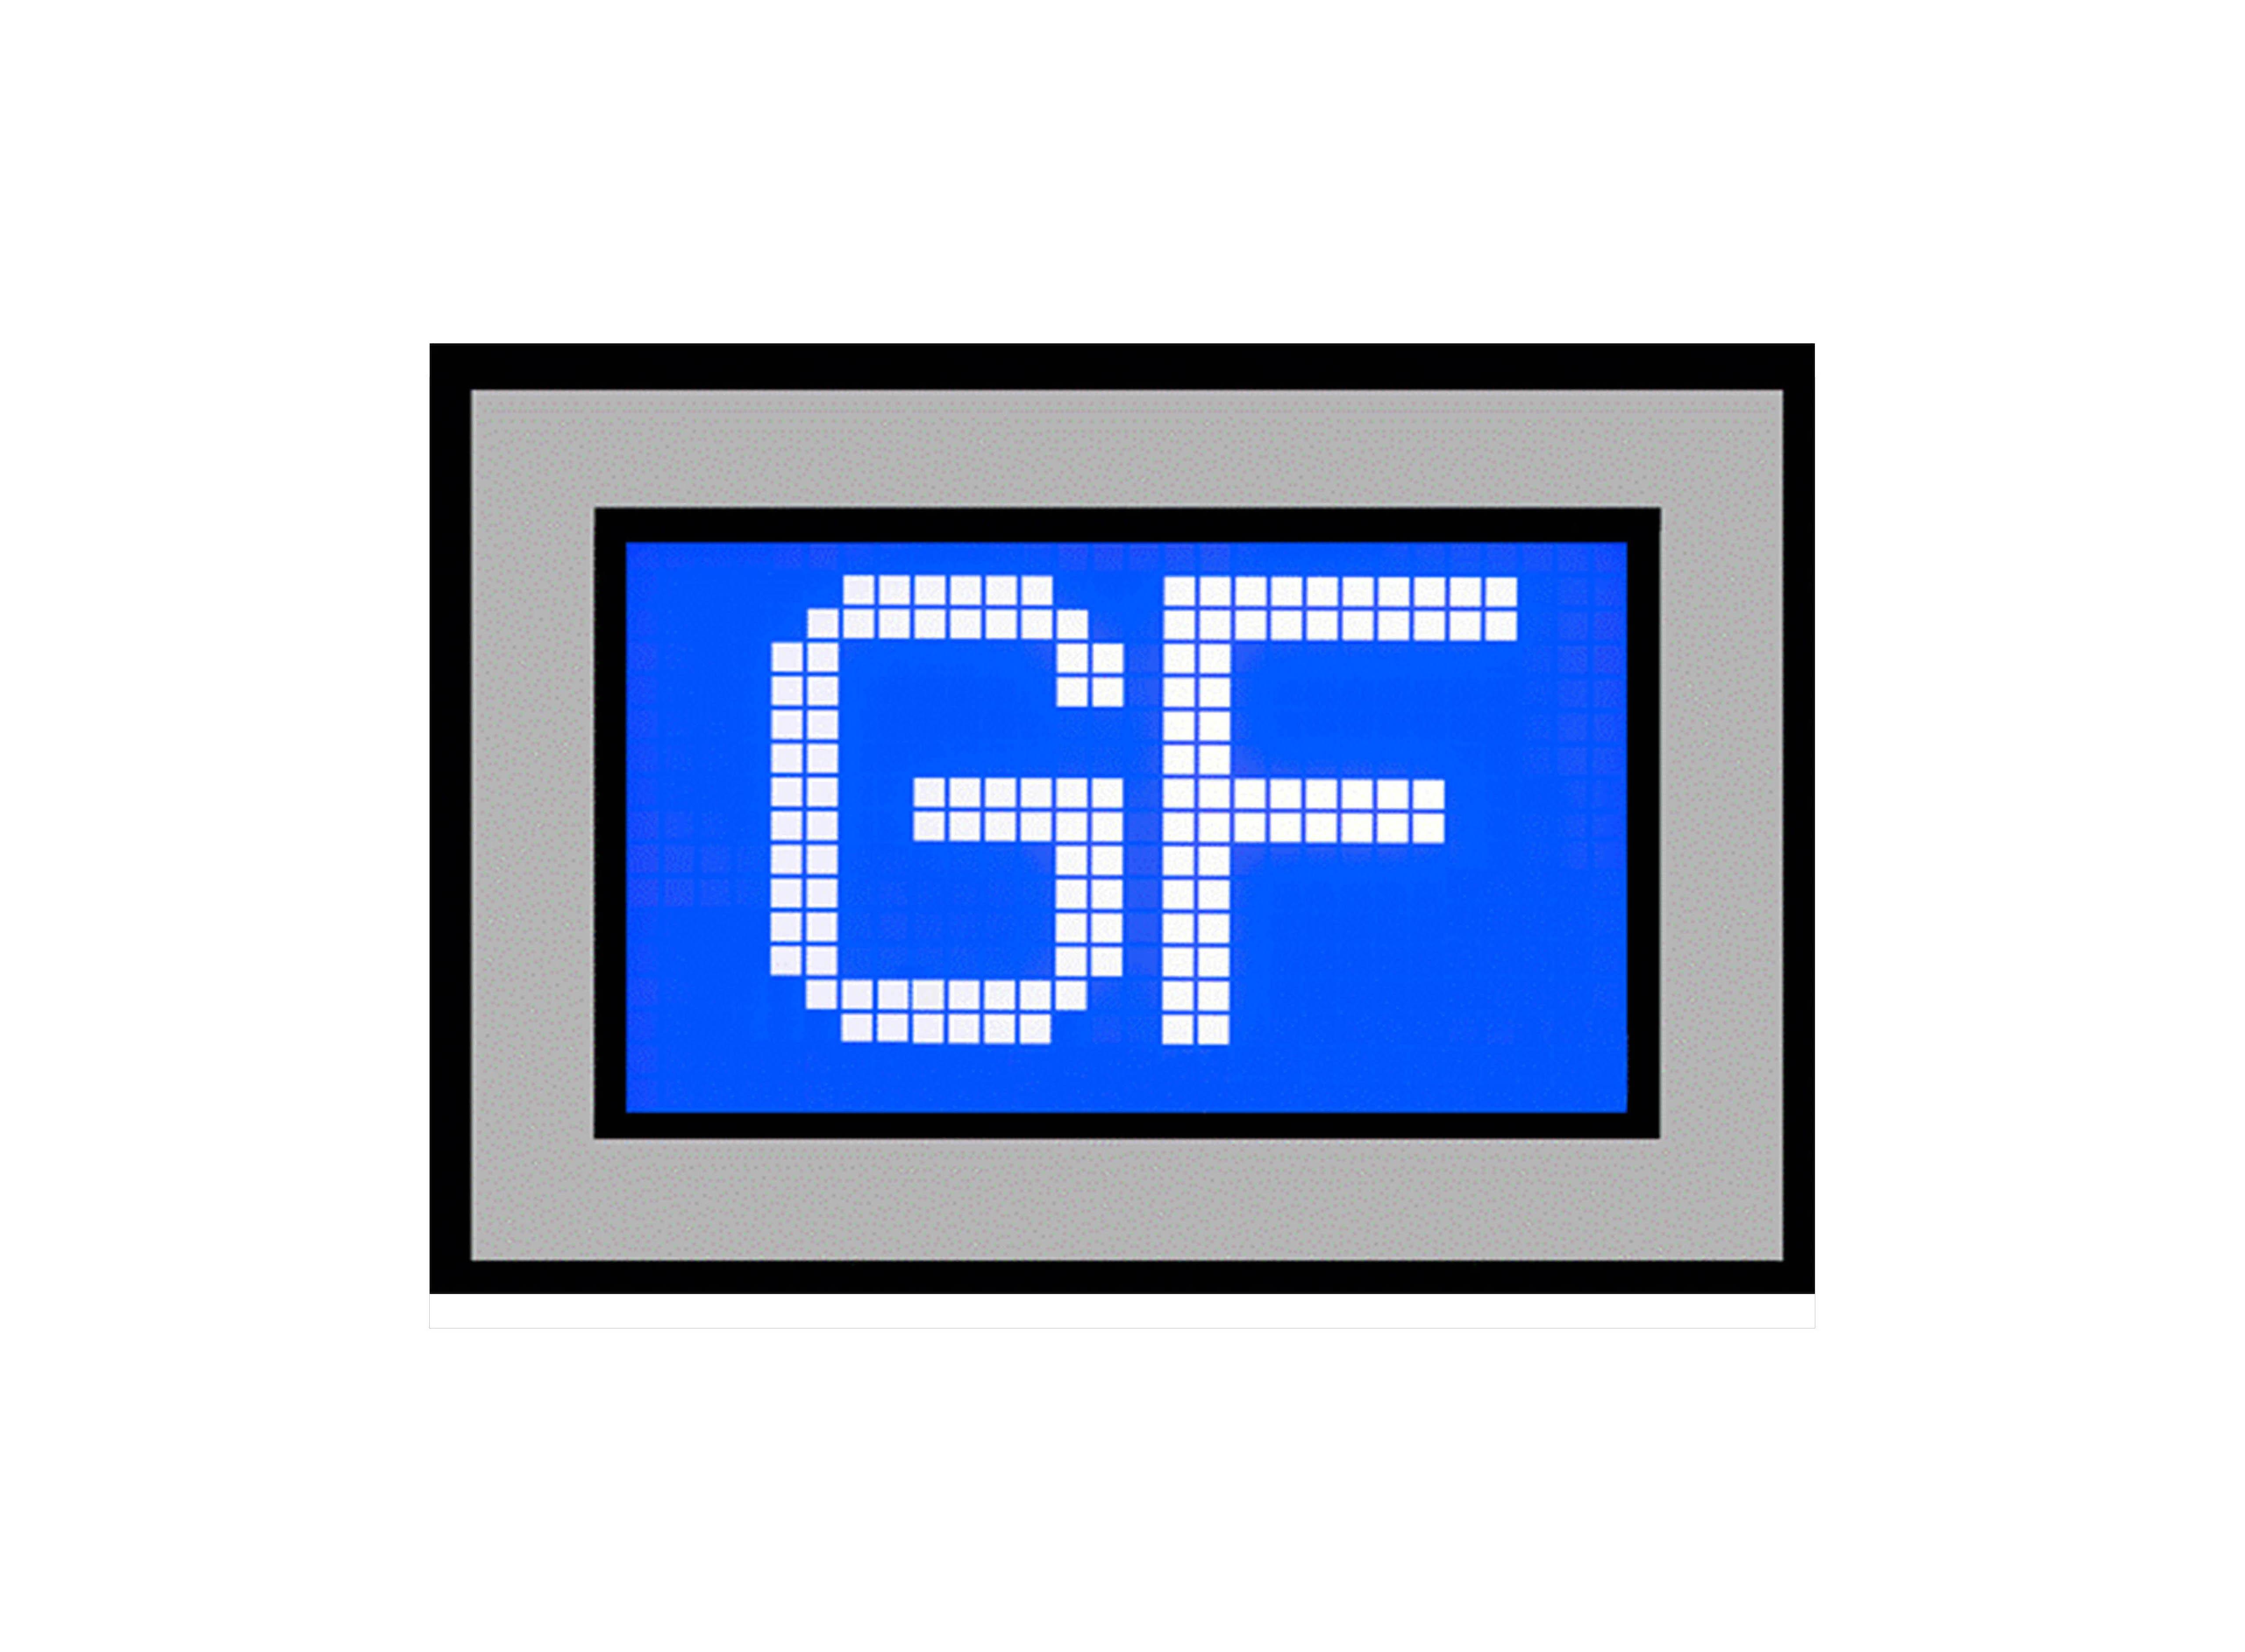 UNIVERSAL  PROGRAMMABLE  SCROLLING  LCD INDICATOR −  UNILCD